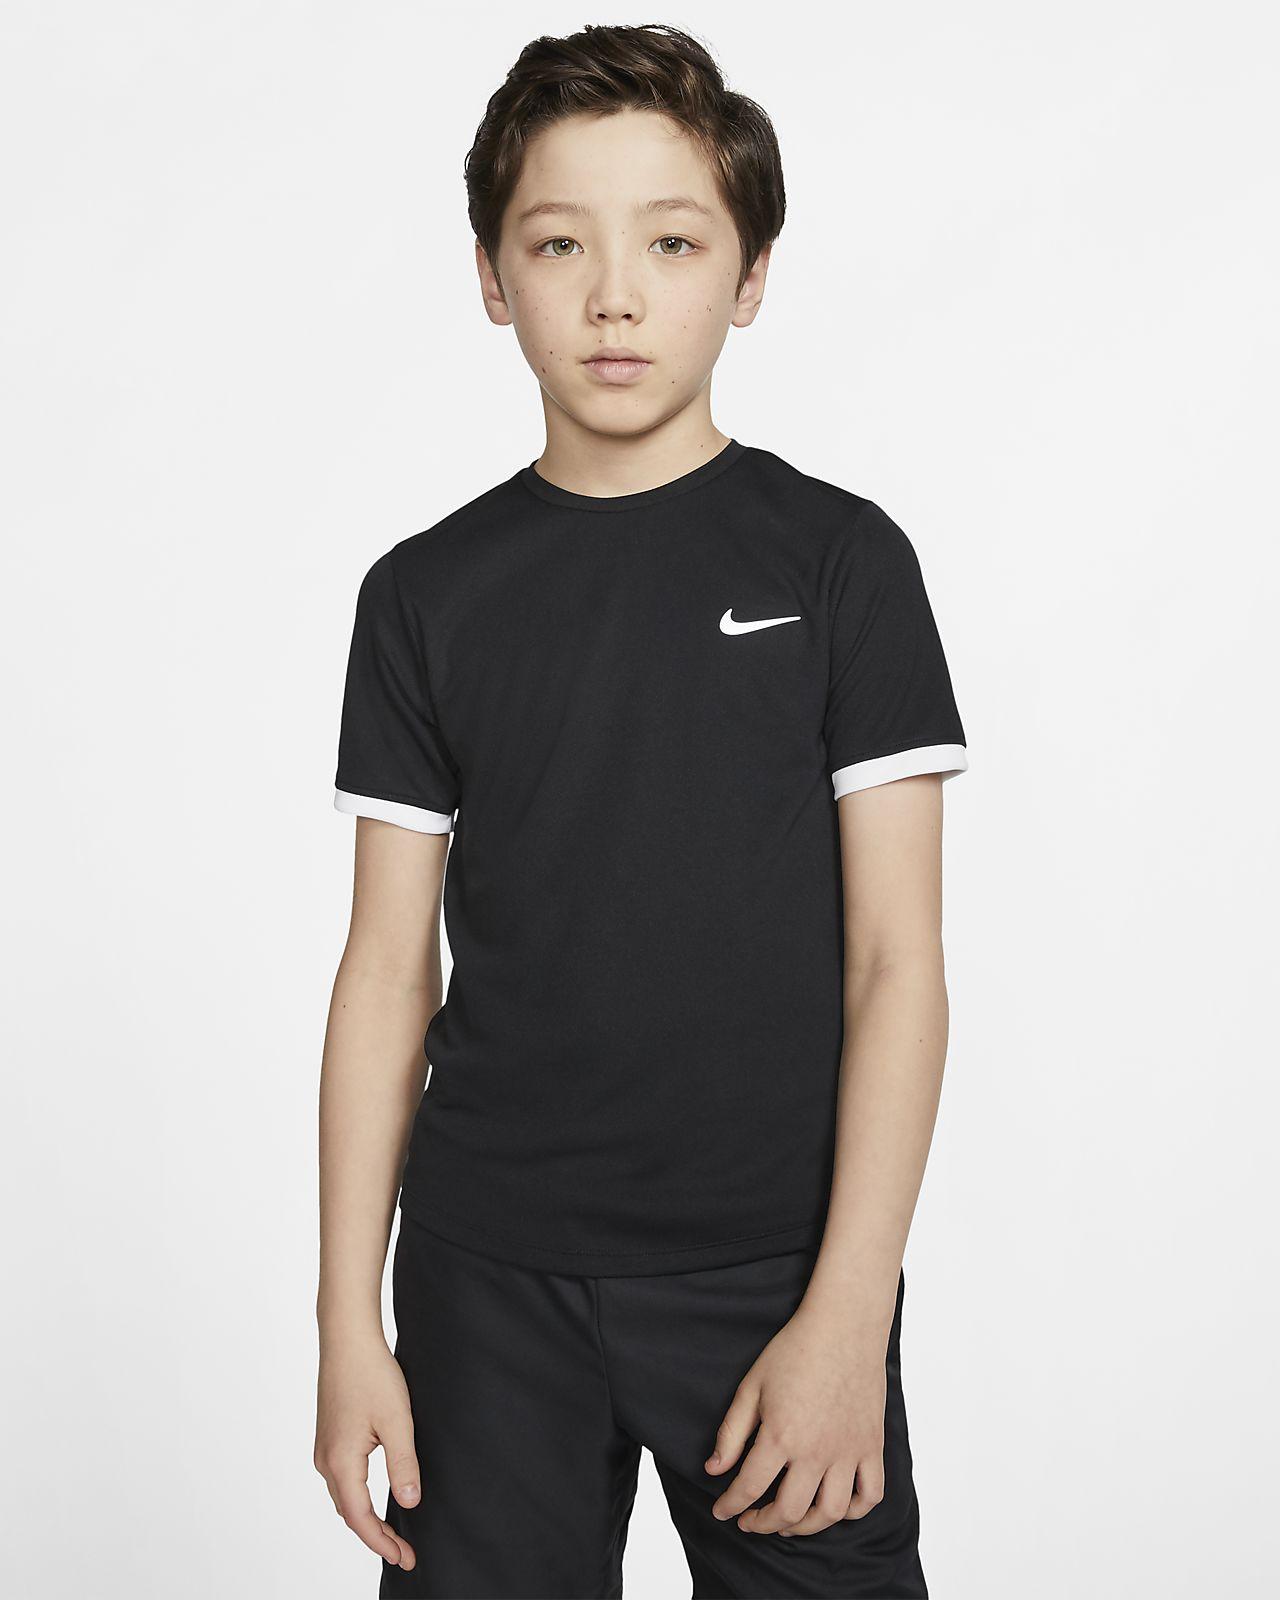 Camisola de ténis de manga curta NikeCourt Dri-FIT Júnior (Rapaz)